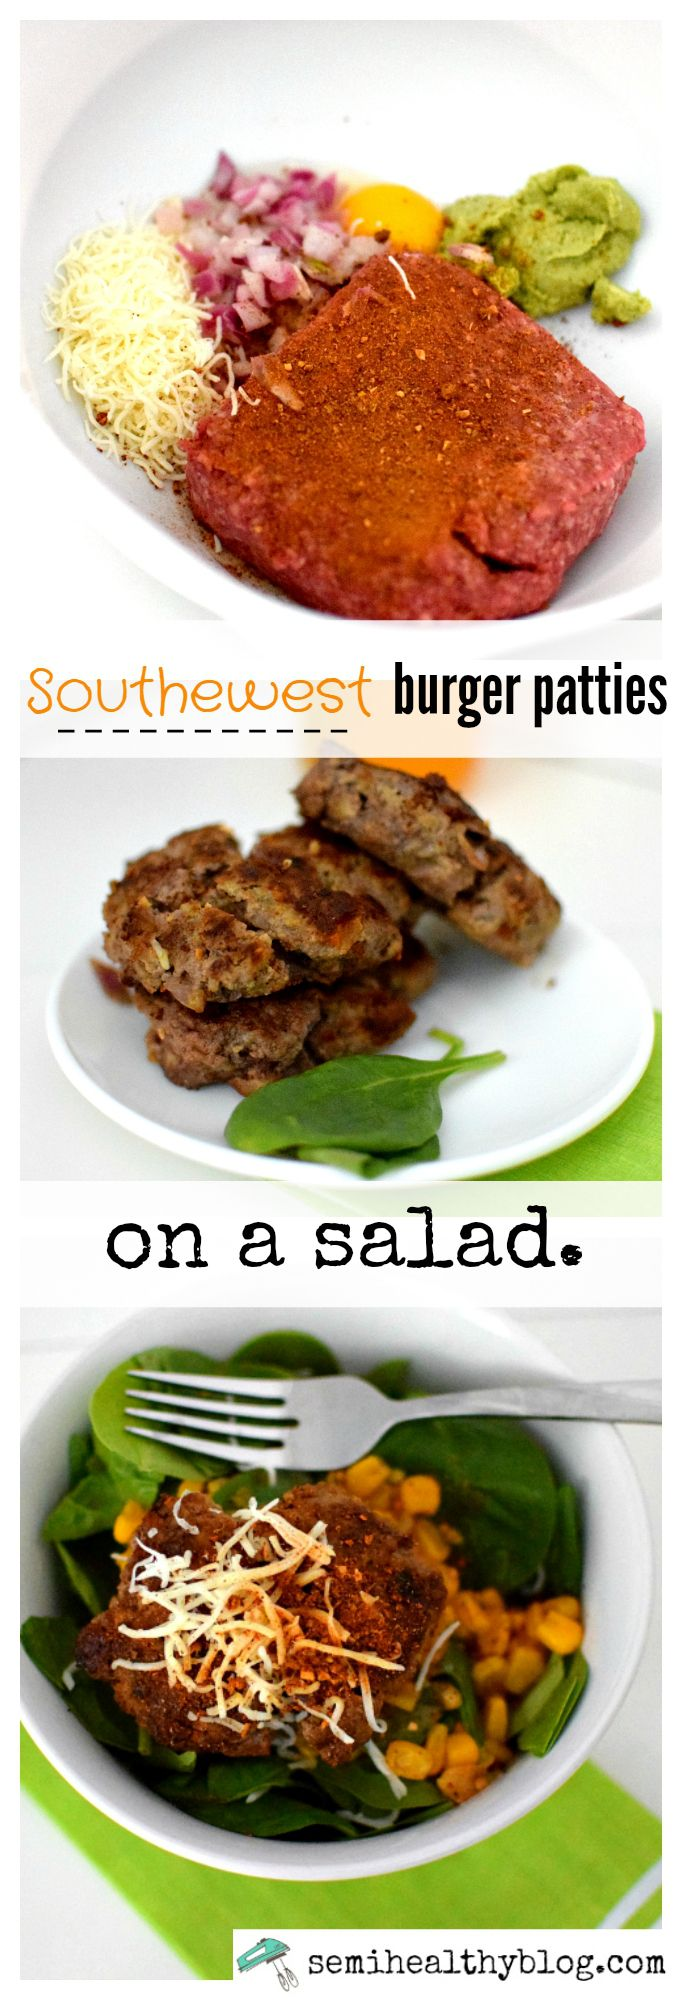 southwest burger patties on a salad for food prep via @semihealthnut at semihealthyblog.com